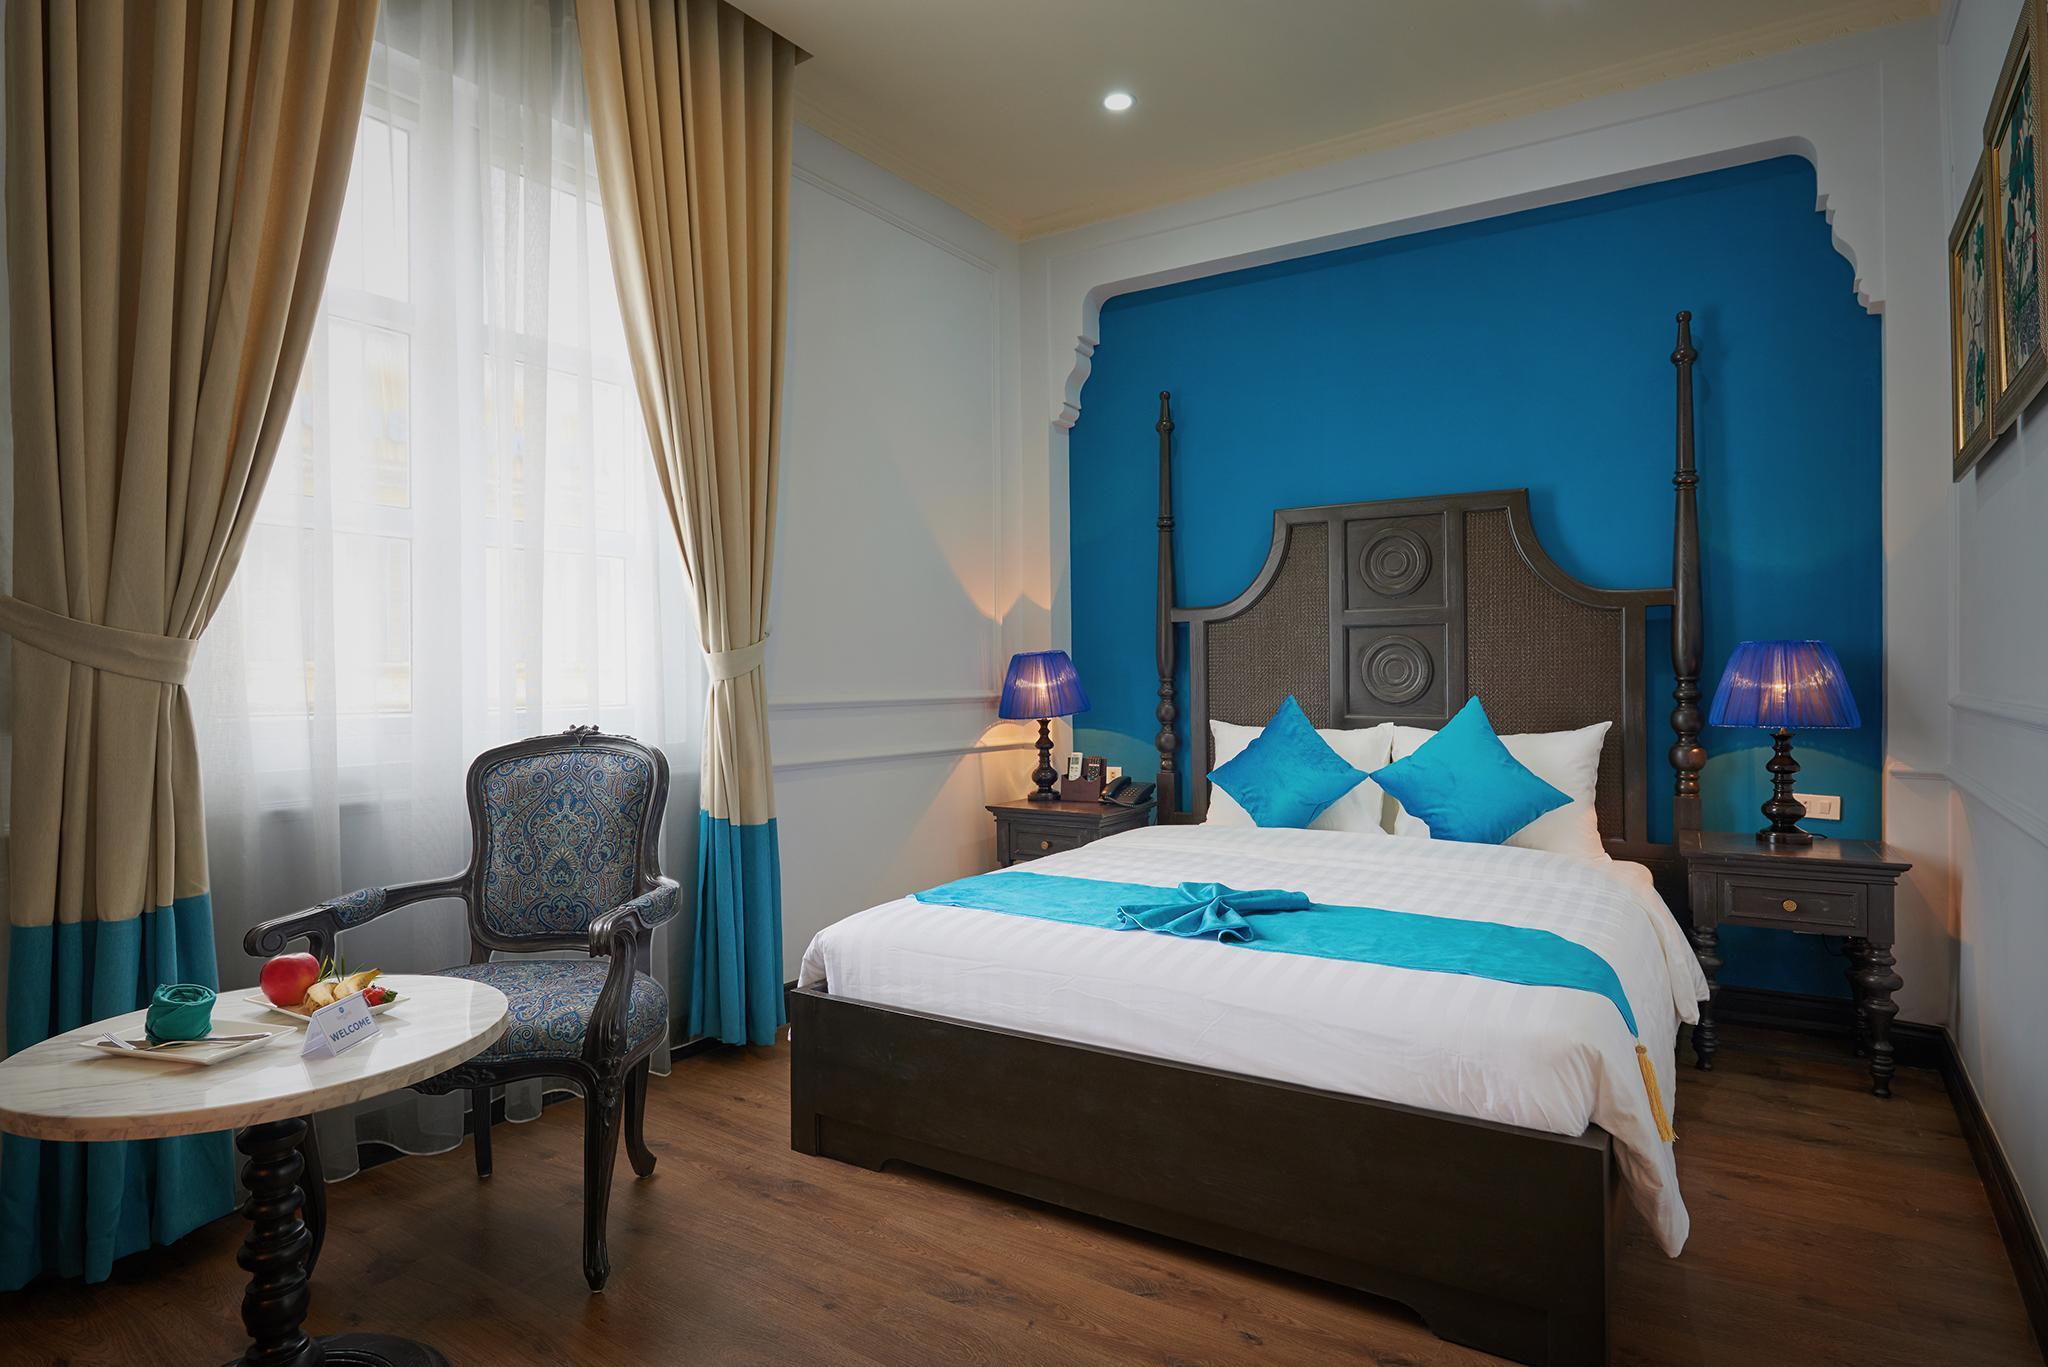 Manoir Des Arts Hotel